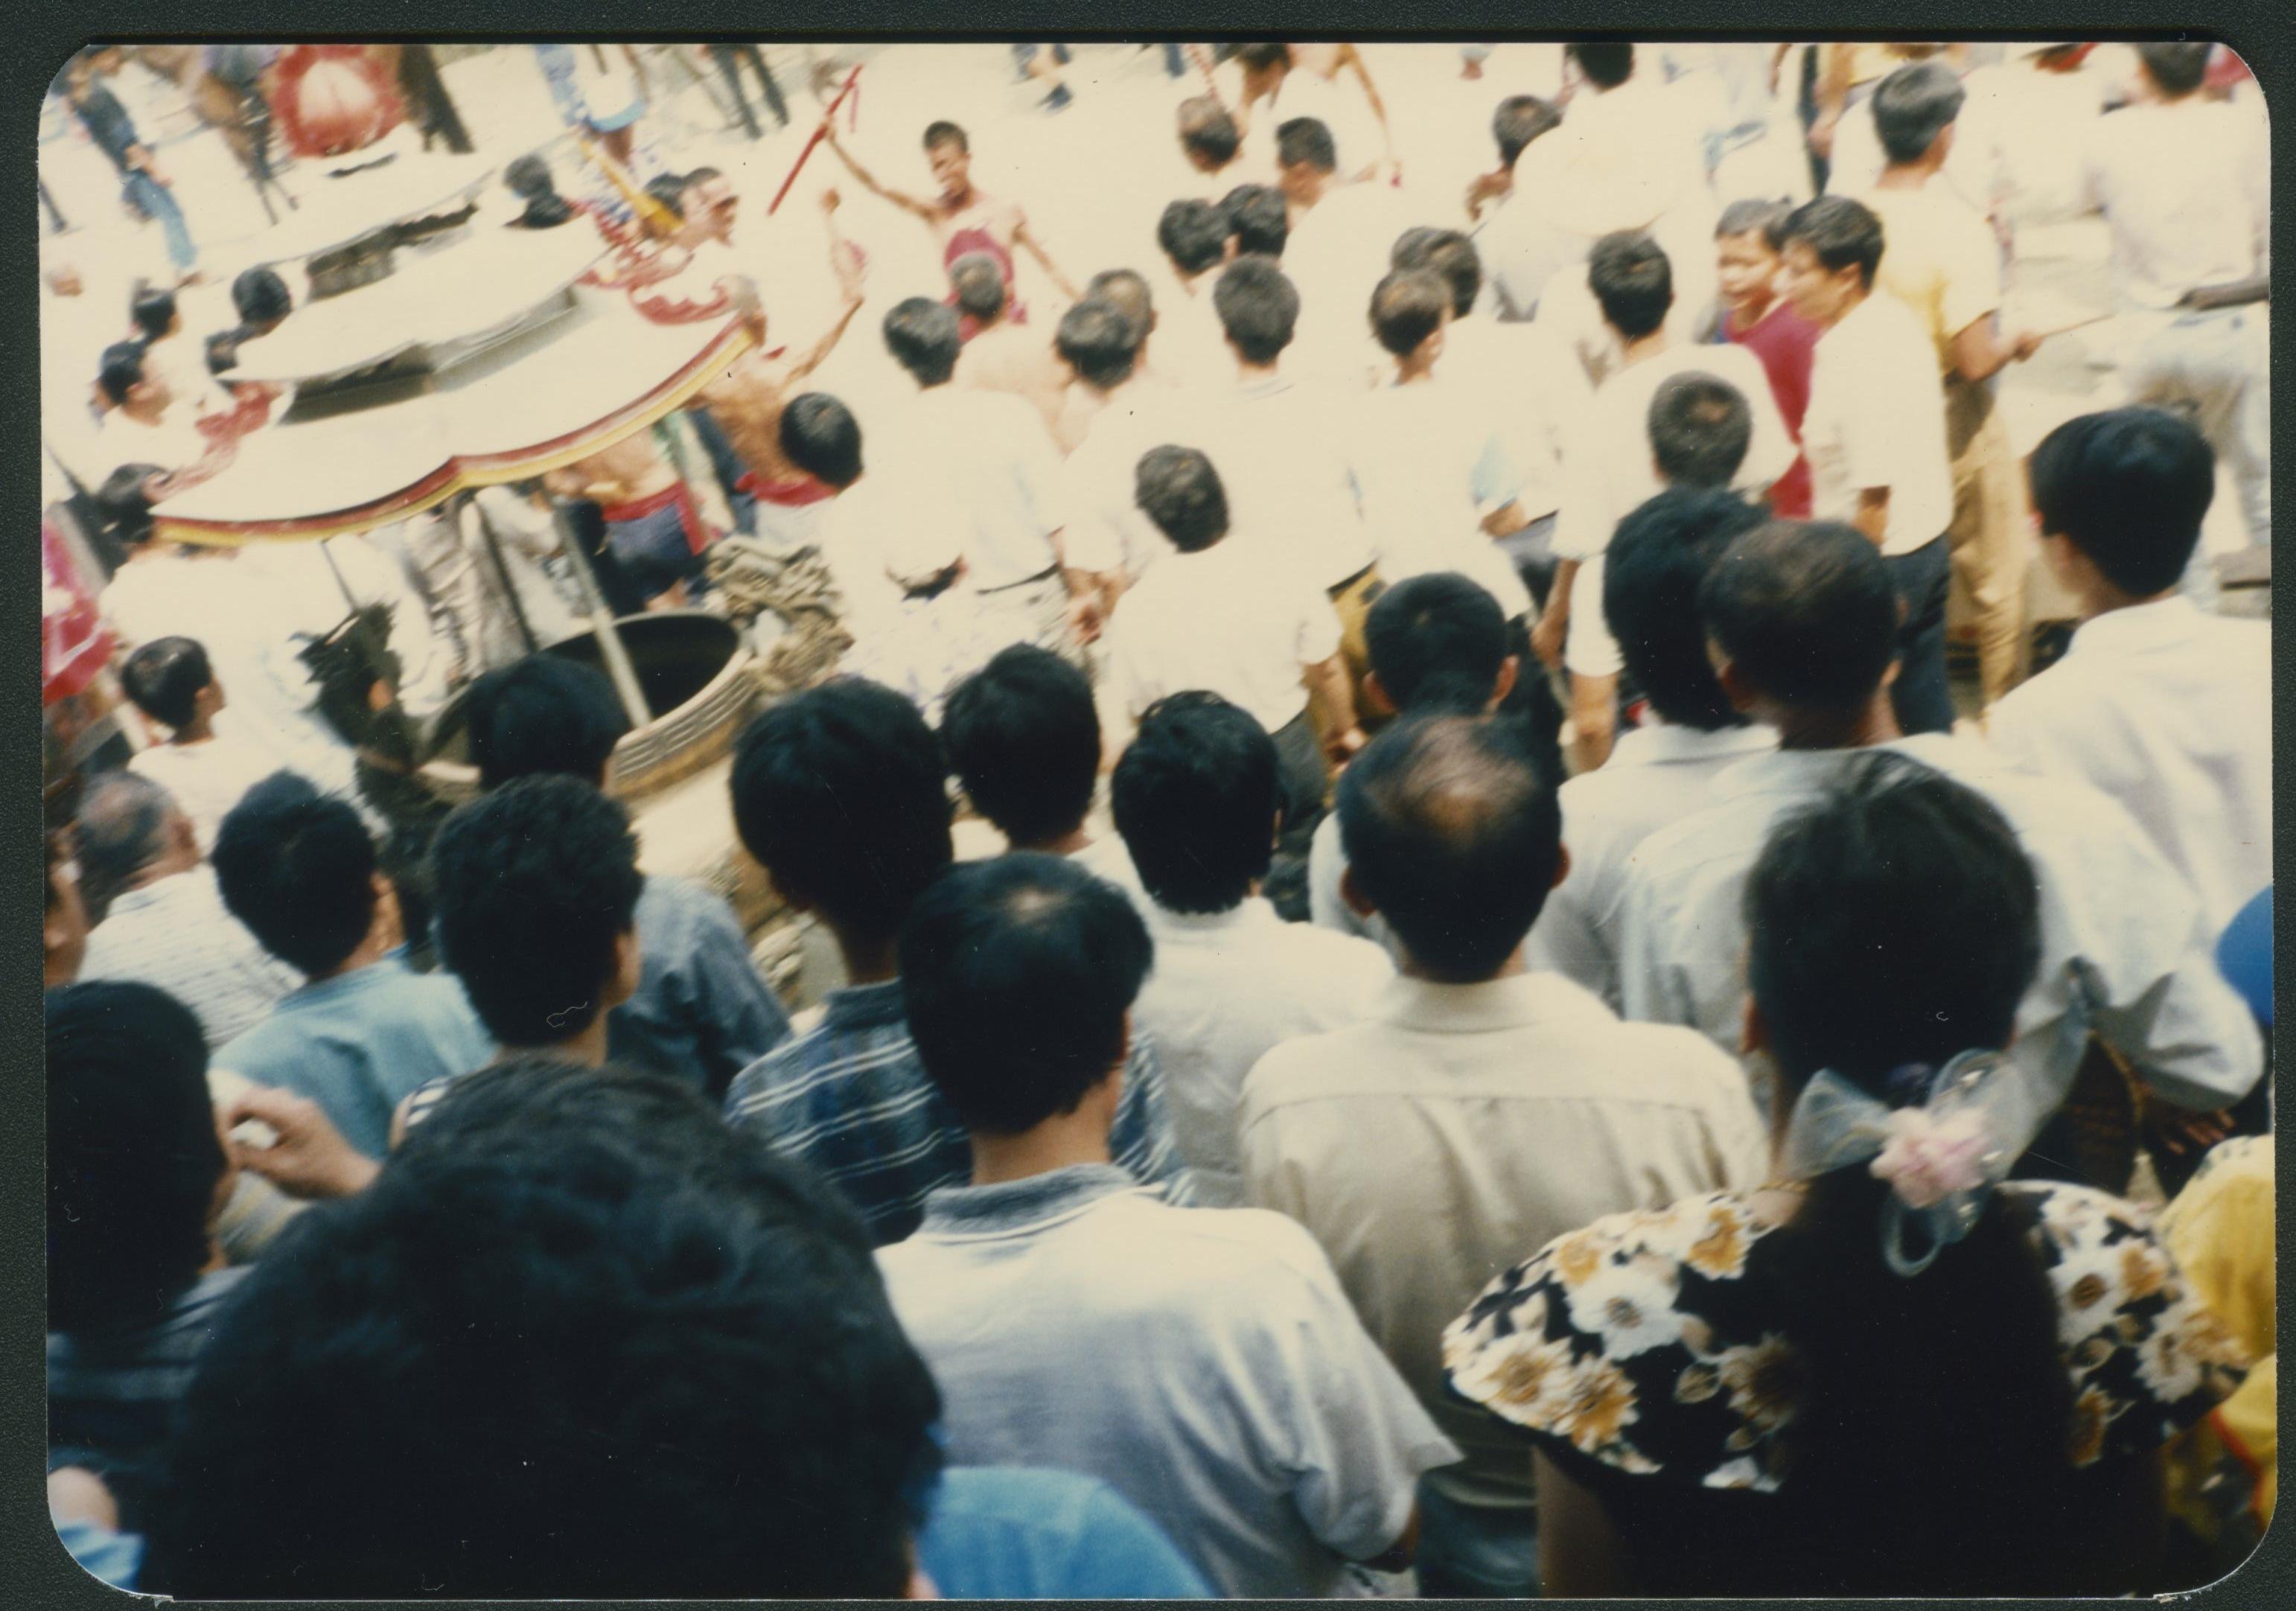 ny-0003-0045-1994